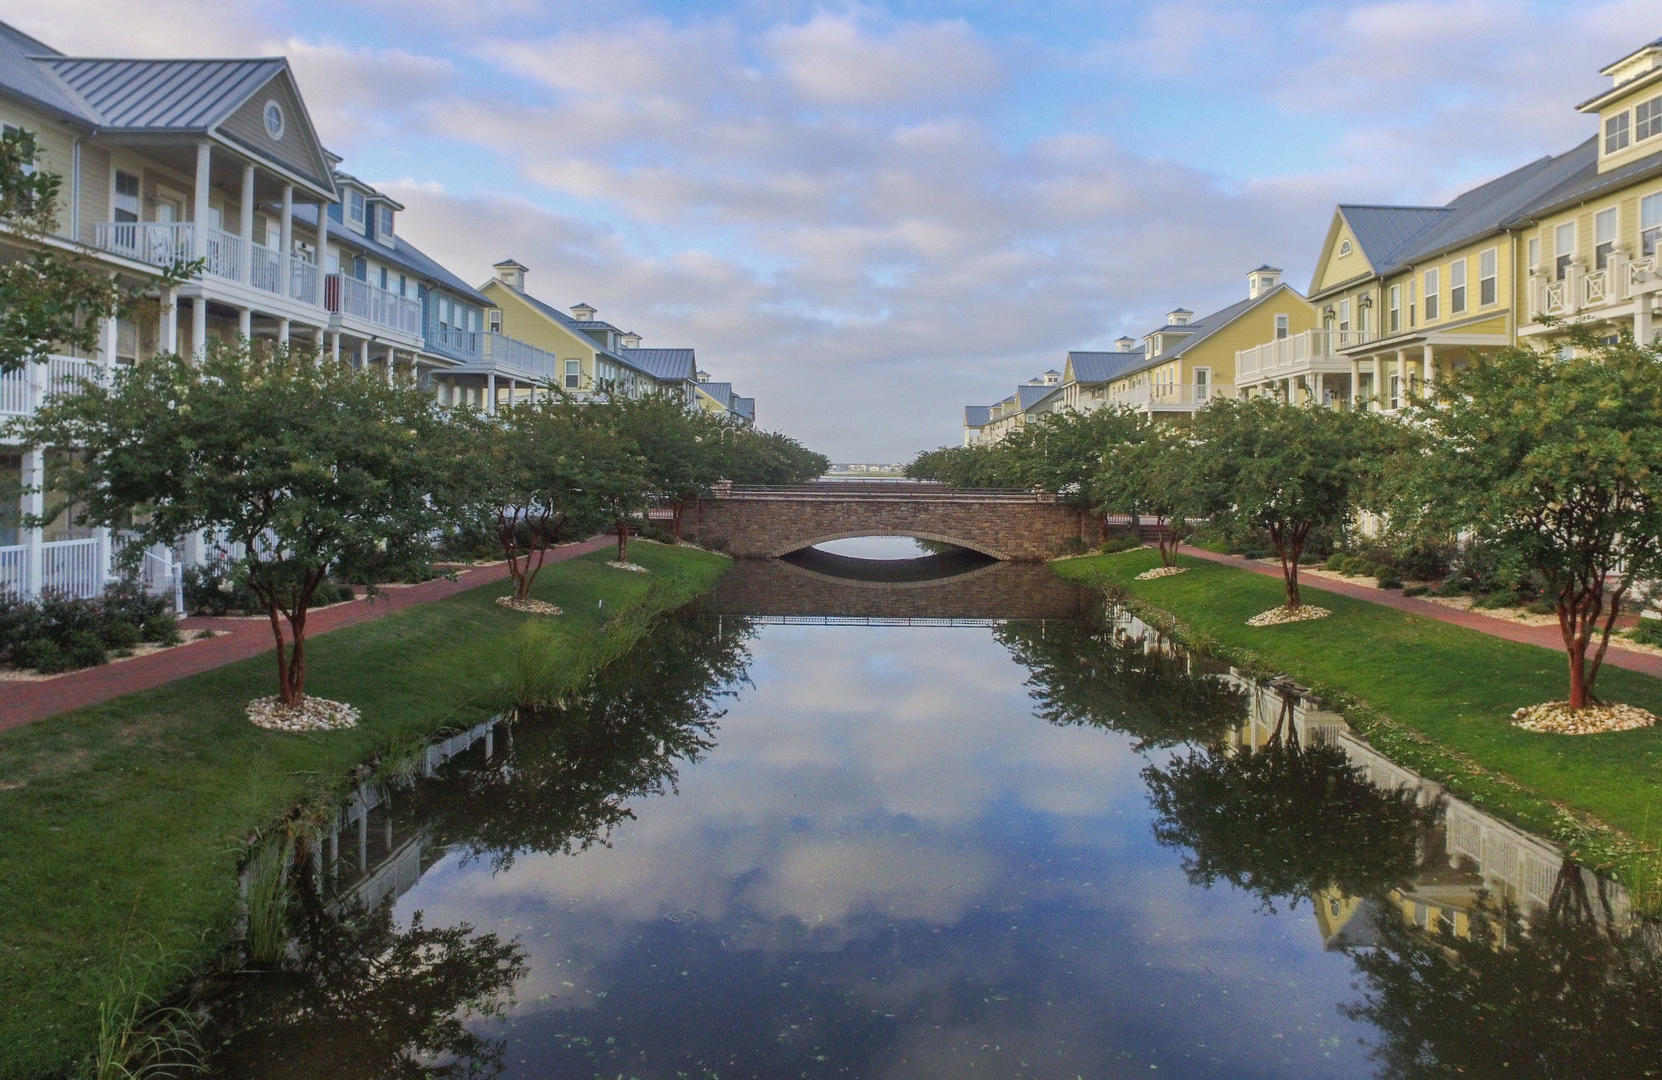 Sunset Island - Canal and Bridges